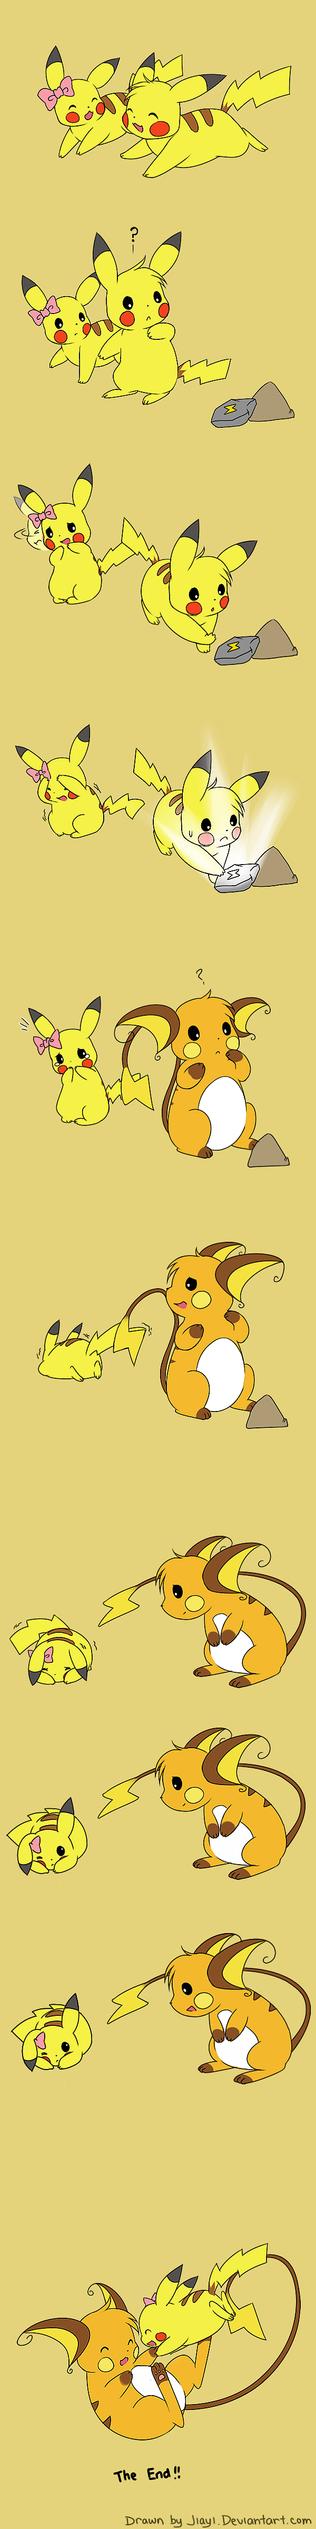 A tale of 2 Pikachus by Jiayi